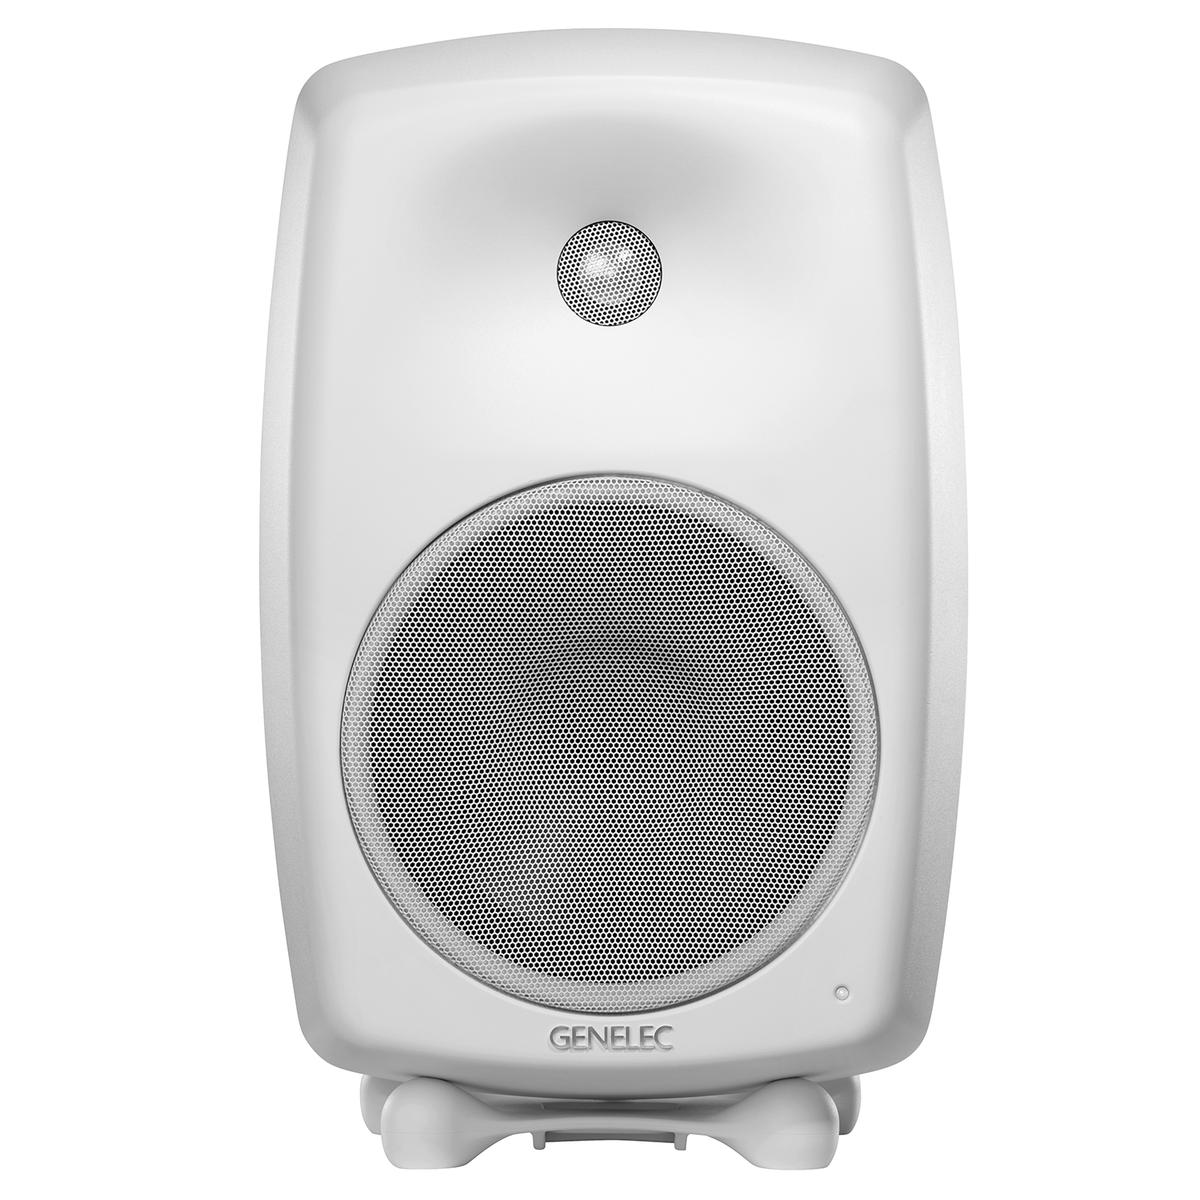 Genelec G Four active speaker, white